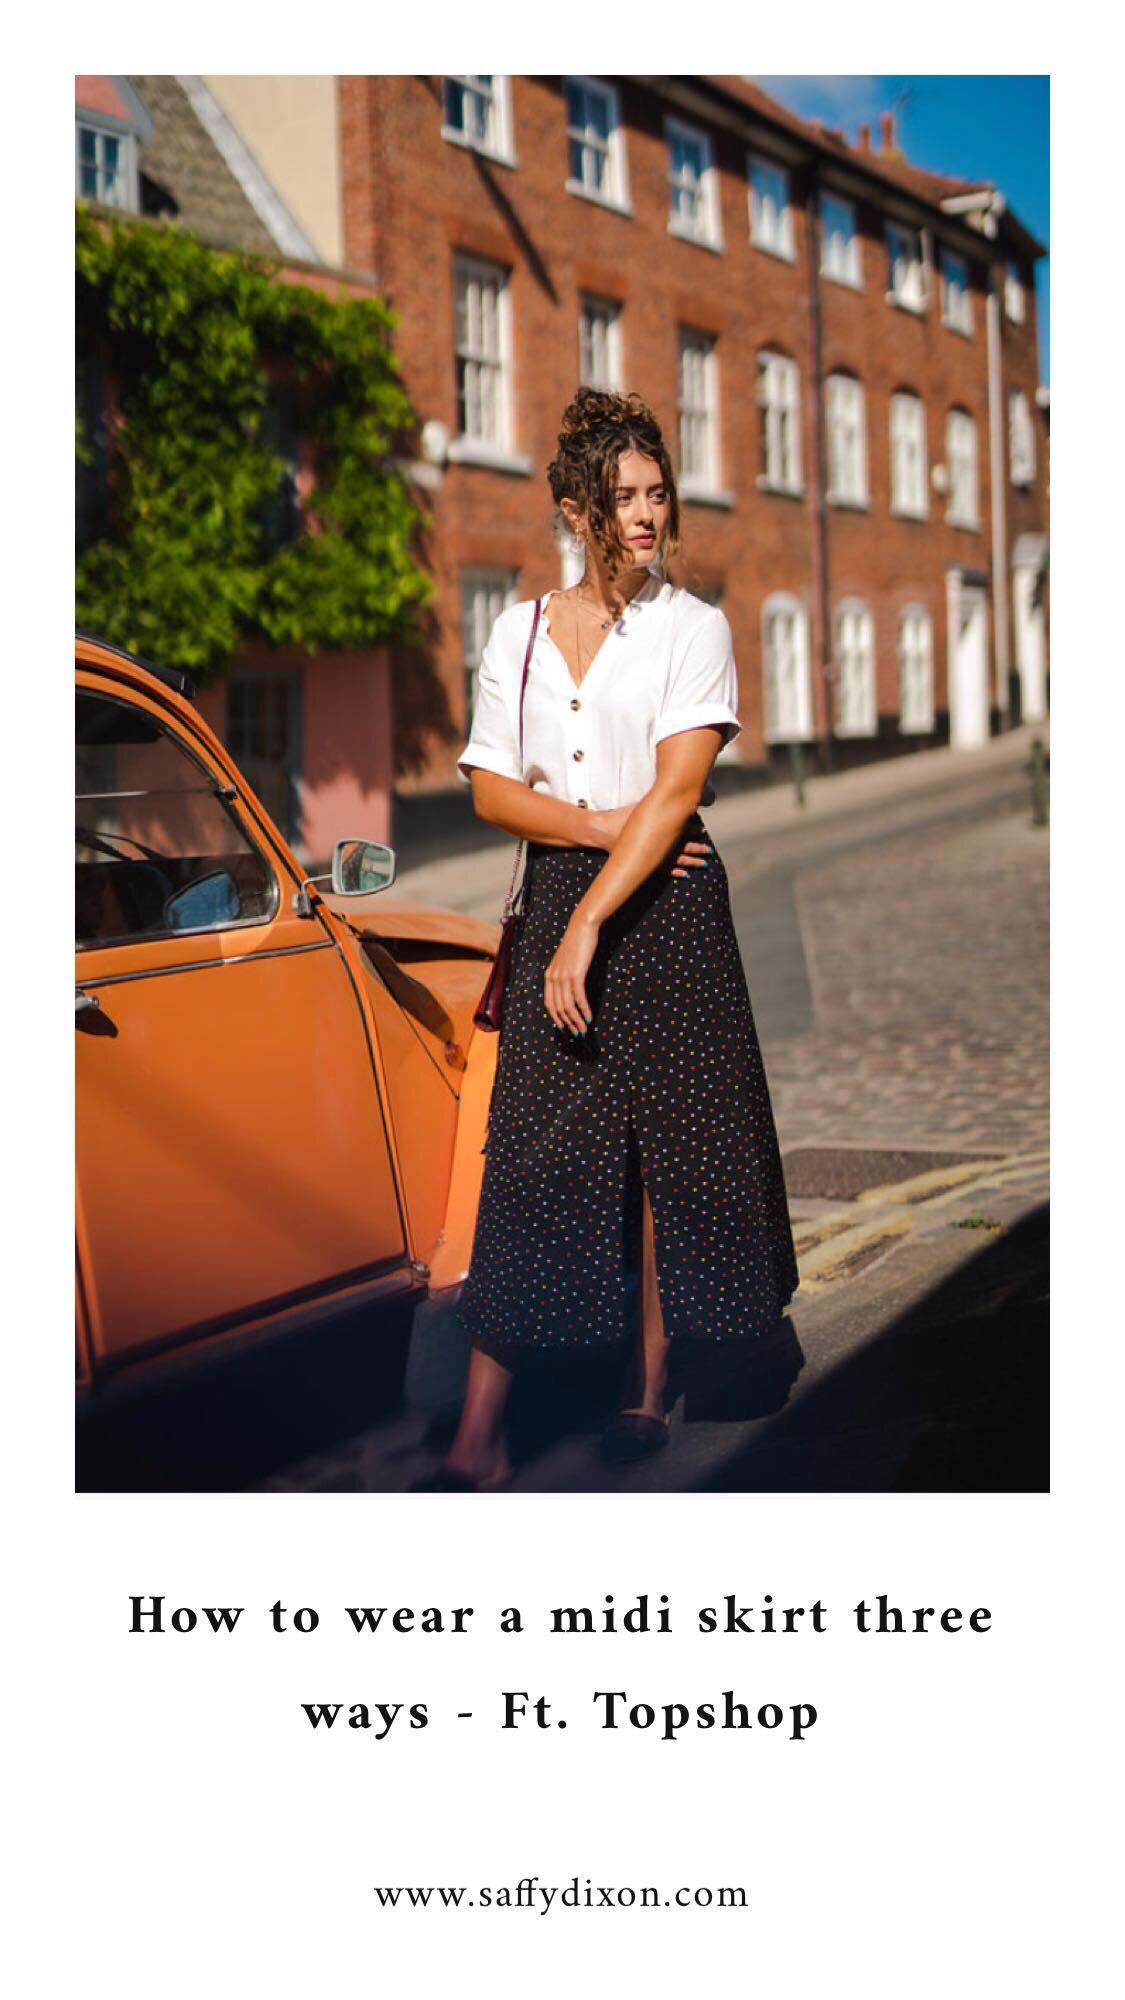 How to wear a midi skirt three ways